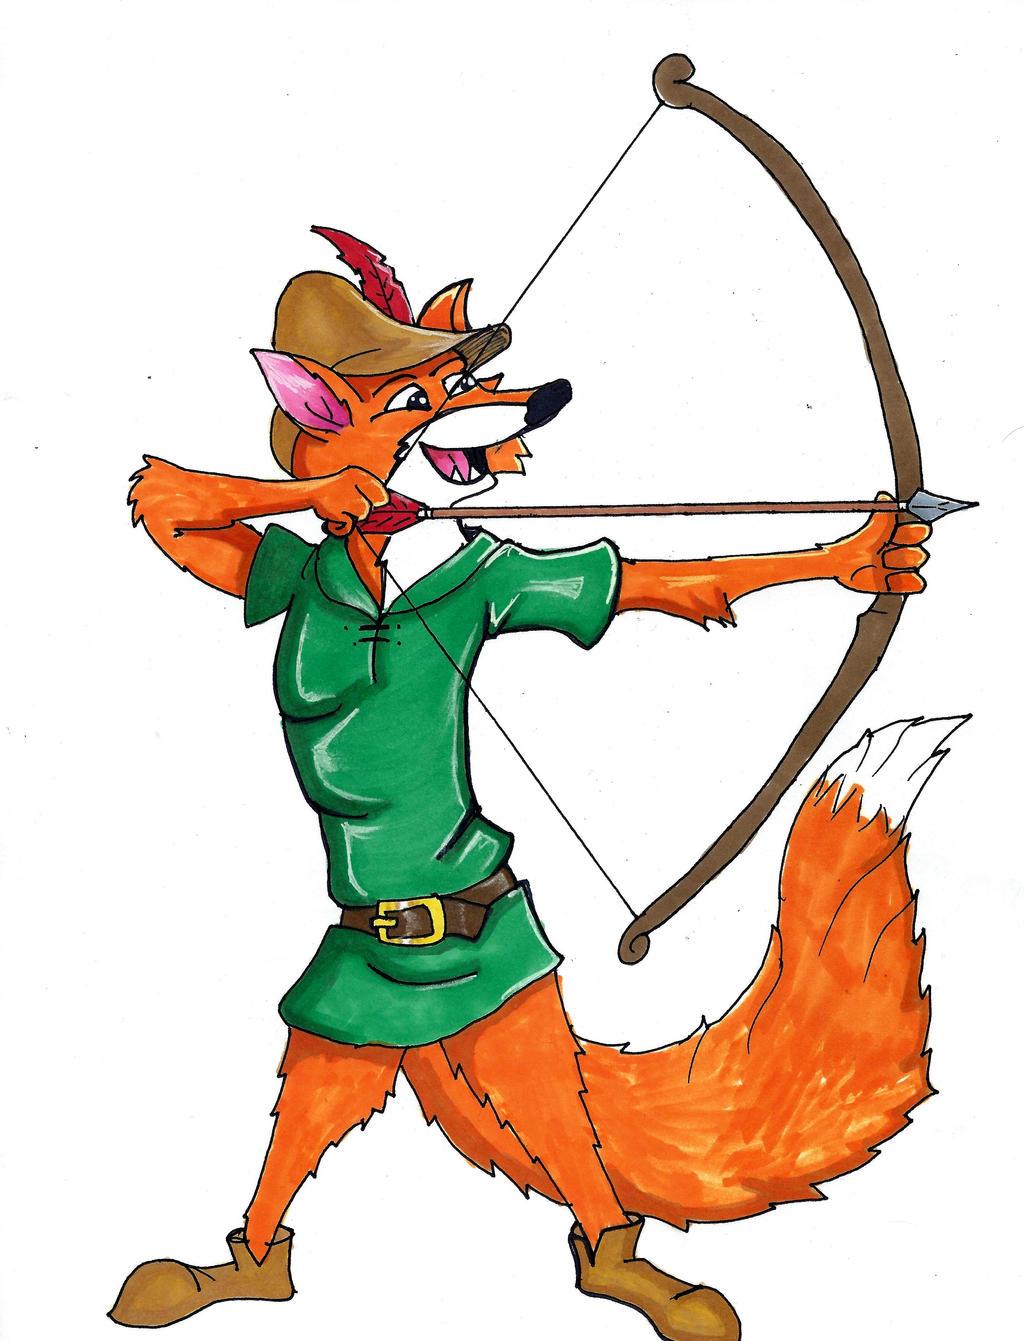 Disney's Robin Hood by Spartan-055 on DeviantArt